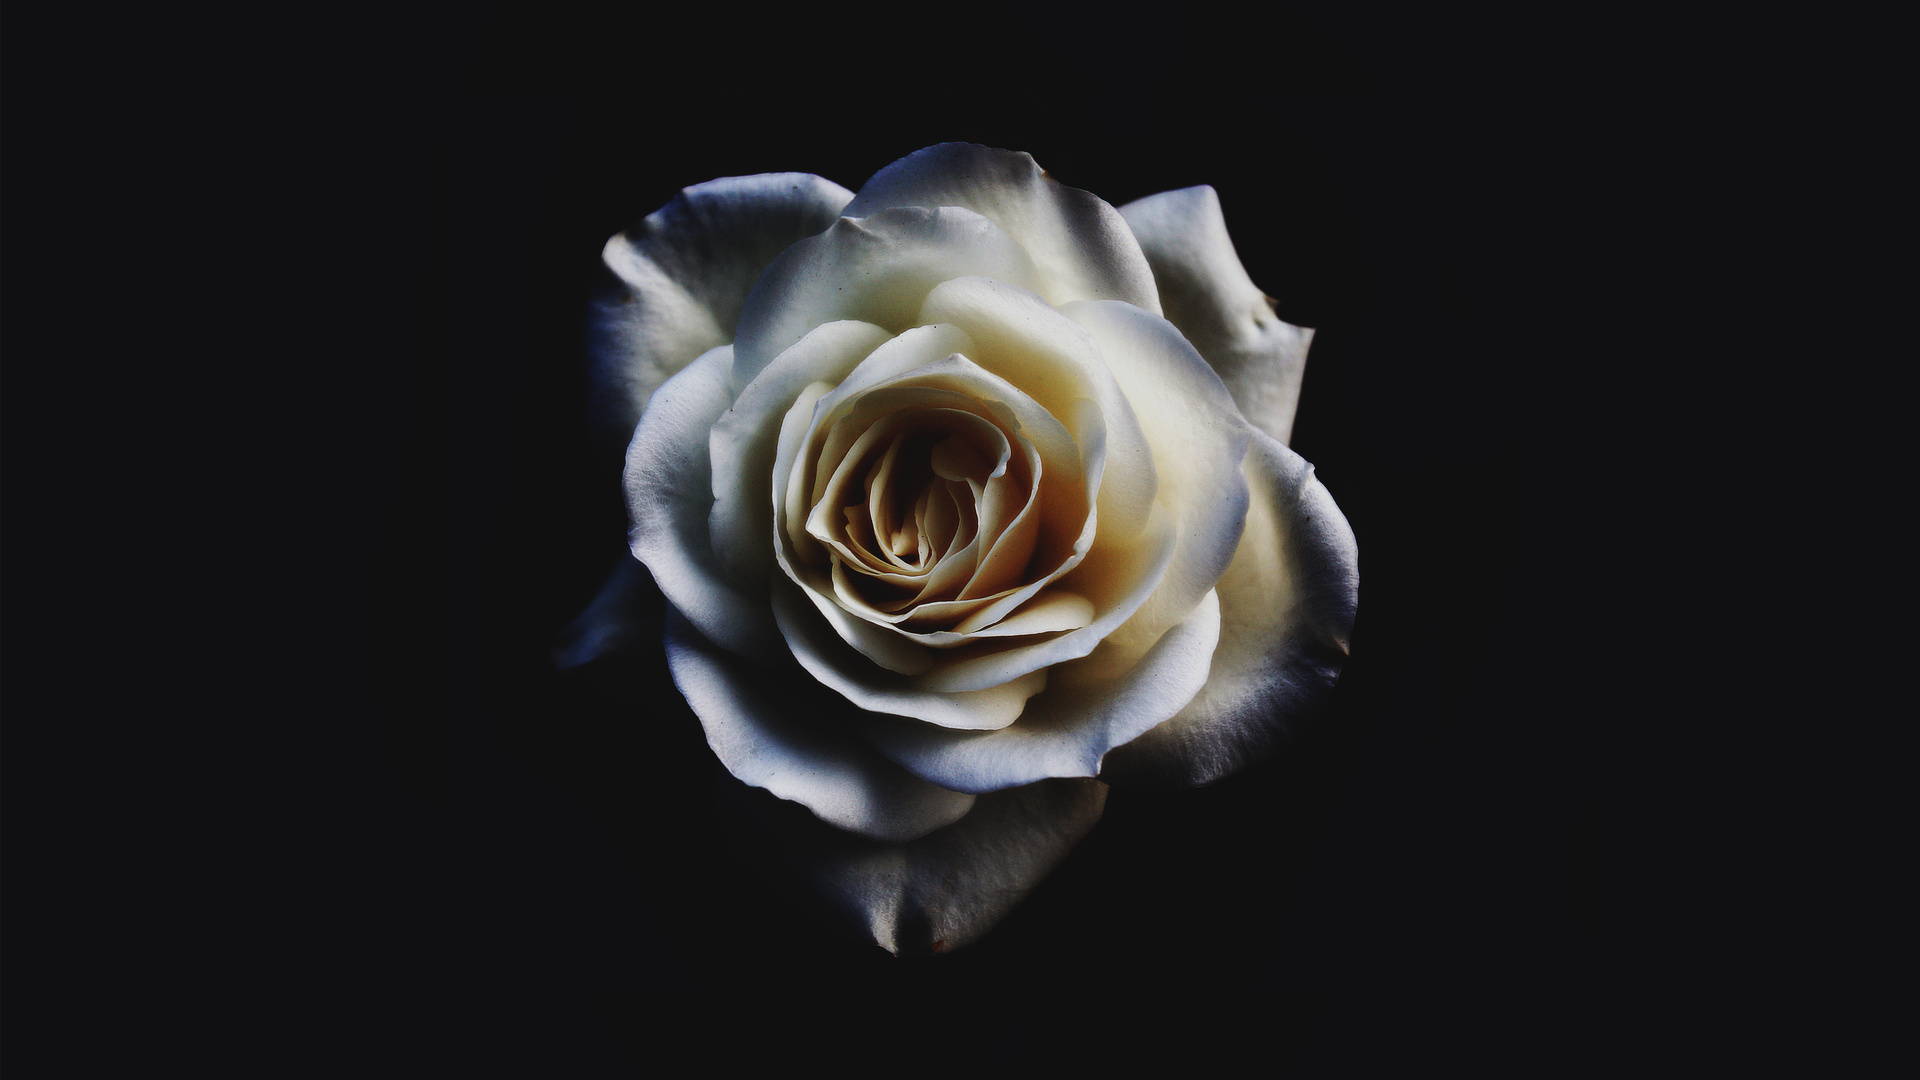 1920x1080 White Rose Laptop Full Hd 1080p Hd 4k Wallpapers Images